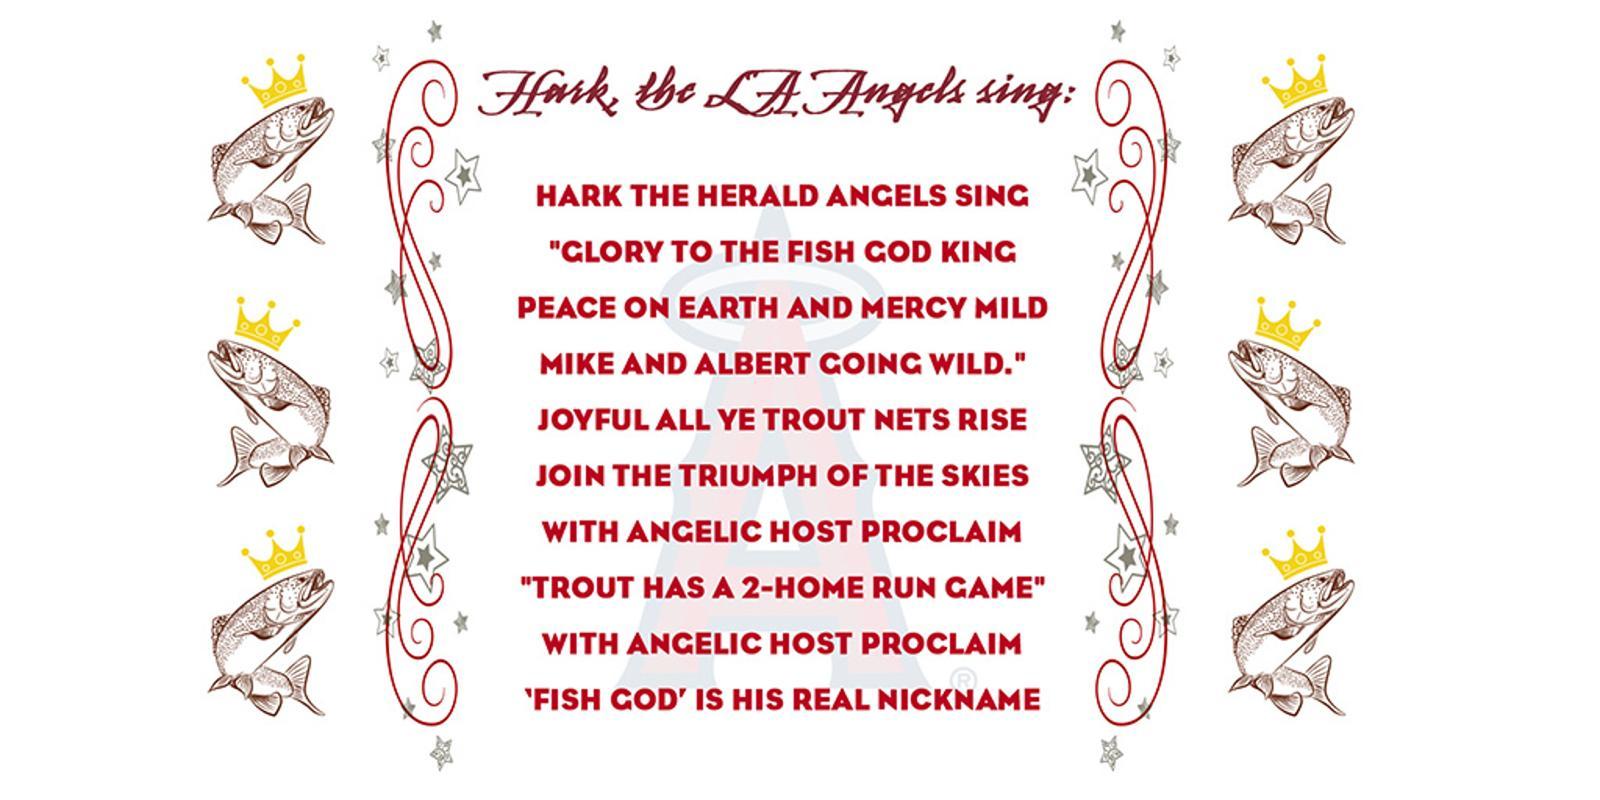 MLB themed Christmas carols | MLB.com